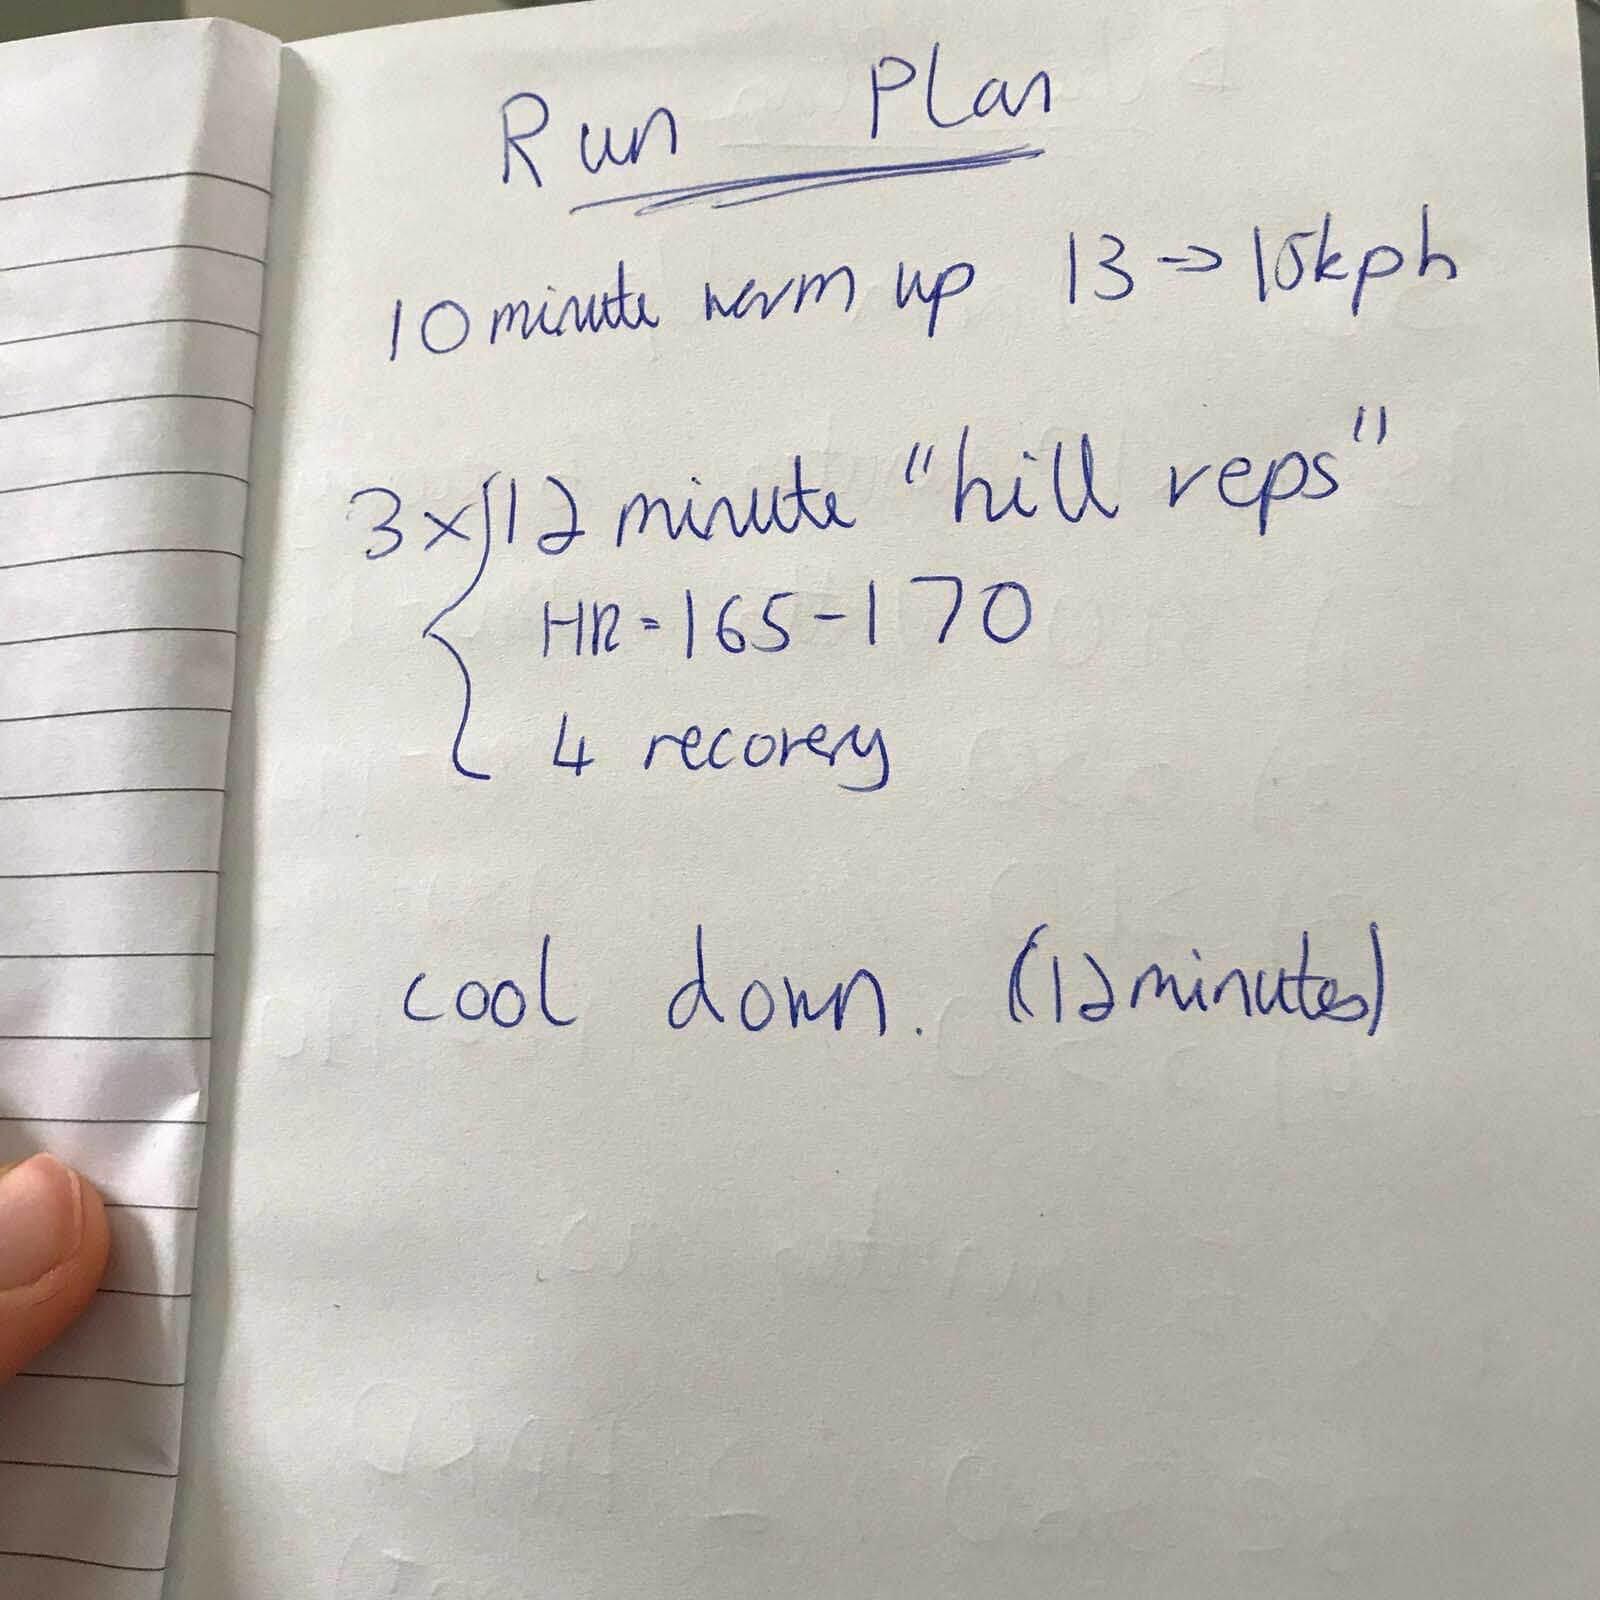 Running training plan for HOKA athlete David McNamee